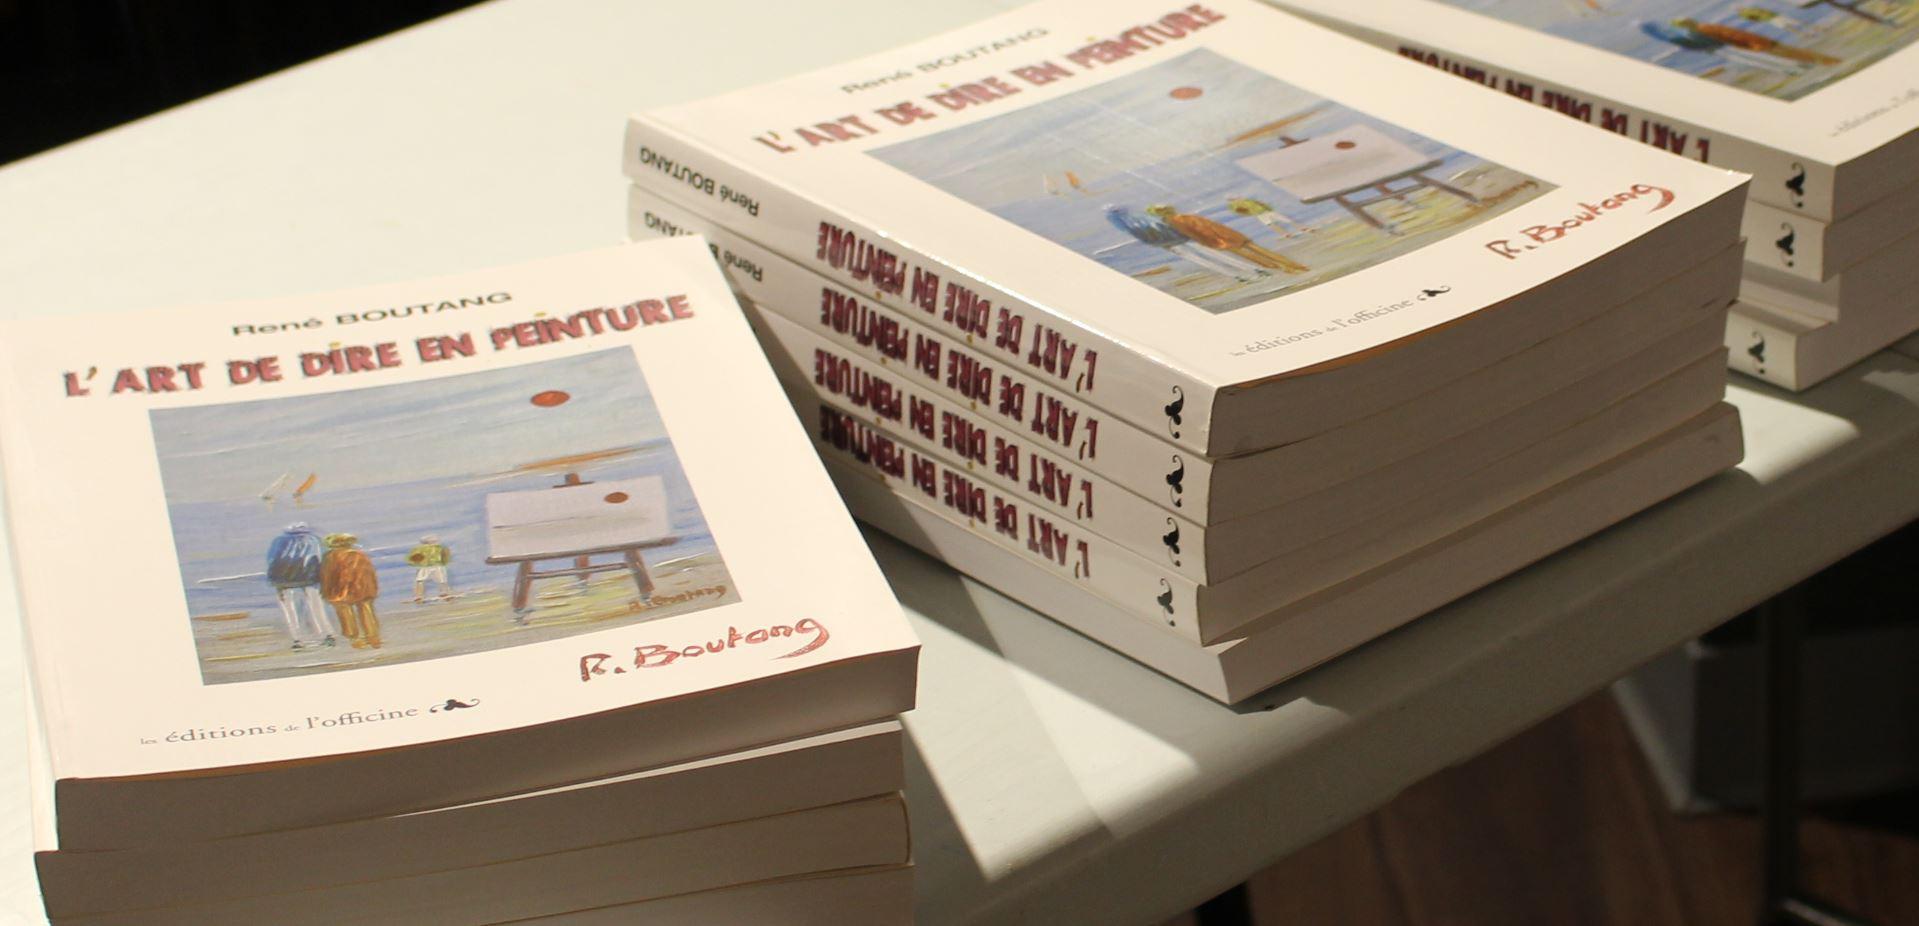 Book written by René Boutang l'Art de dire en peinture